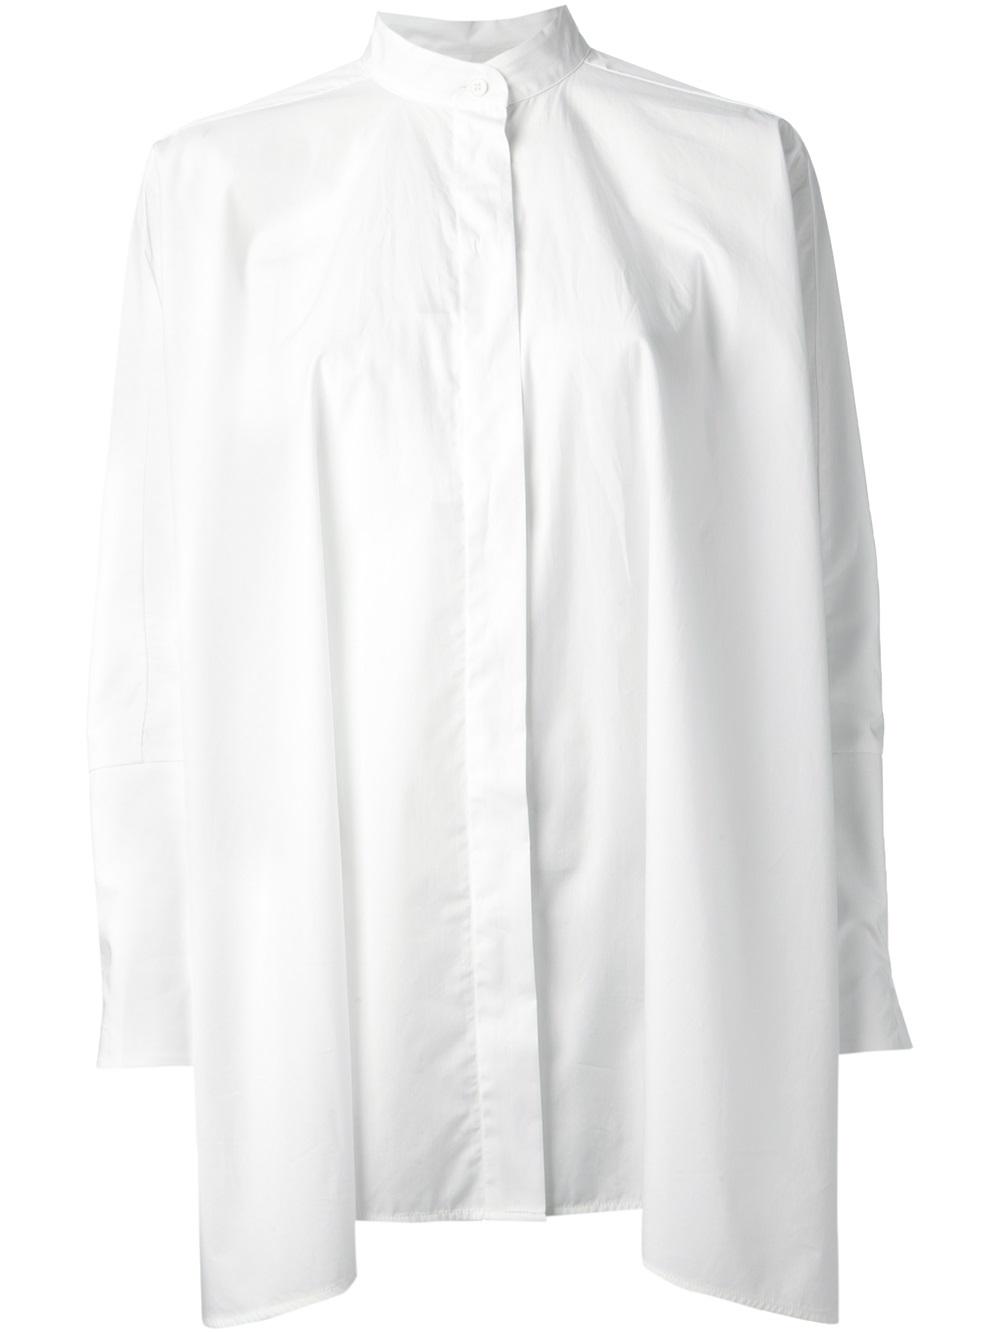 fringed short-sleeve blouse - White Maison Martin Margiela Clearance Ebay New Styles Cheap Online Buy Cheap Perfect Discounts Sale Cheapest nRtklU